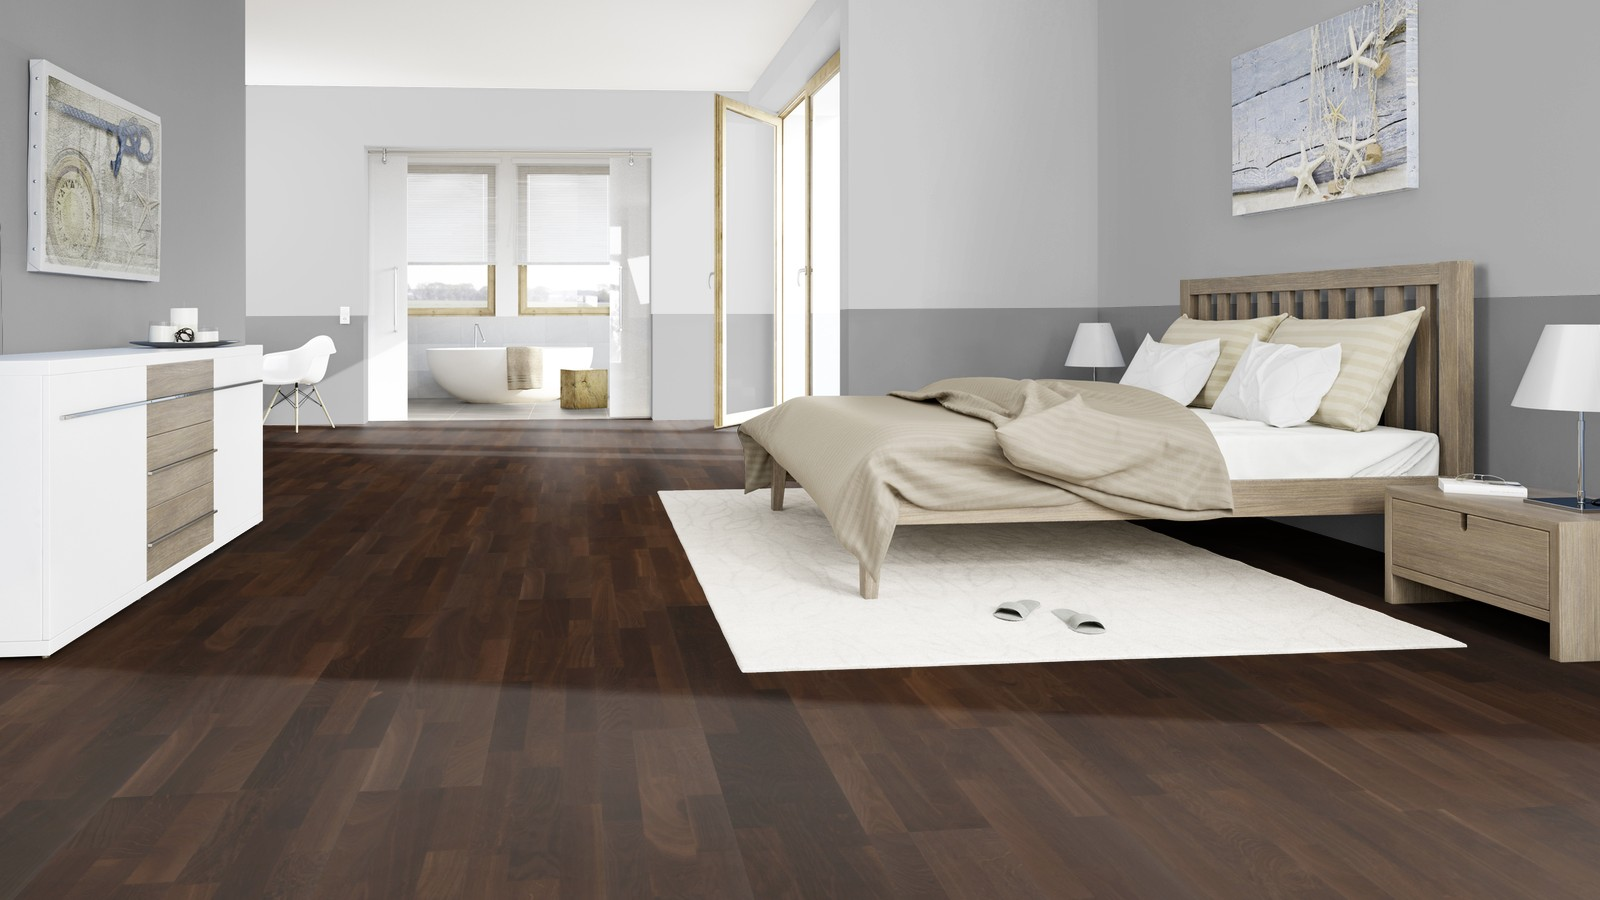 ter h rne straight collection l parkett d21 eiche tabakbraun schiffsboden preisbrecher. Black Bedroom Furniture Sets. Home Design Ideas